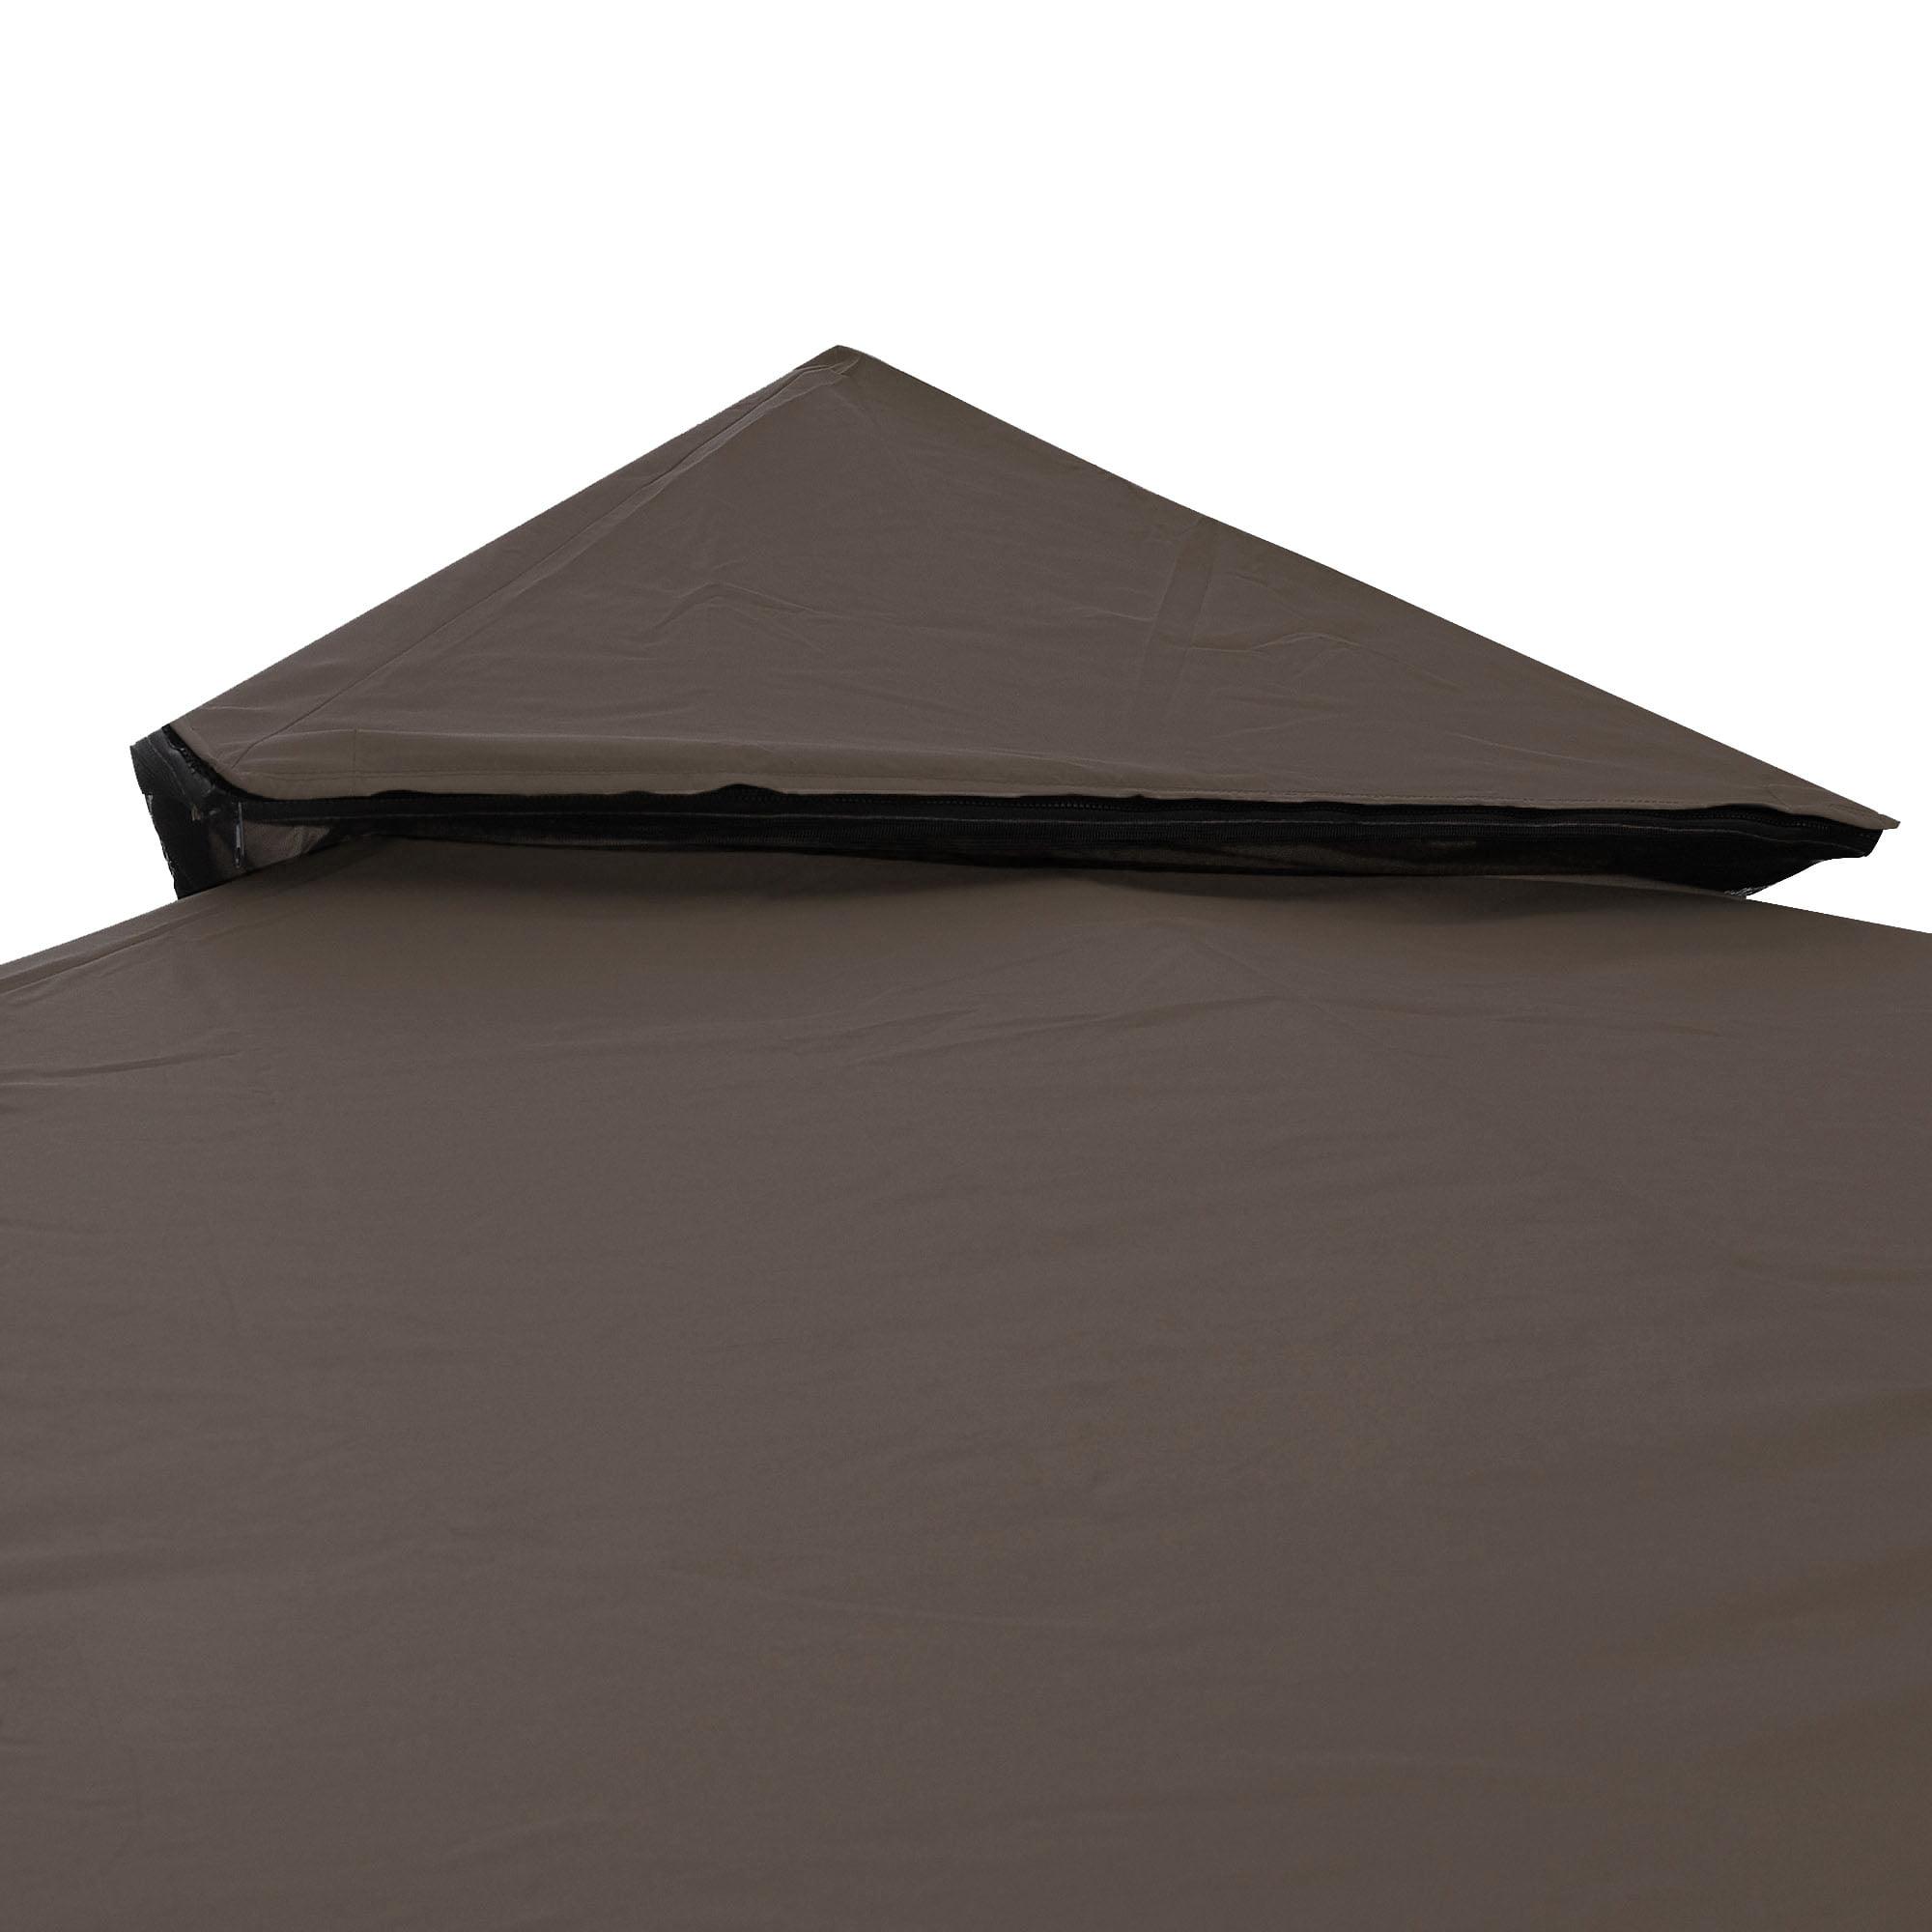 Yescom 8u0027x8u0027 Gazebo Top Canopy Replacement 2 Tier UV30+ 200g/sqm Outdoor Patio Garden Cover - Walmart.com  sc 1 st  Walmart.com & Yescom 8u0027x8u0027 Gazebo Top Canopy Replacement 2 Tier UV30+ 200g/sqm ...